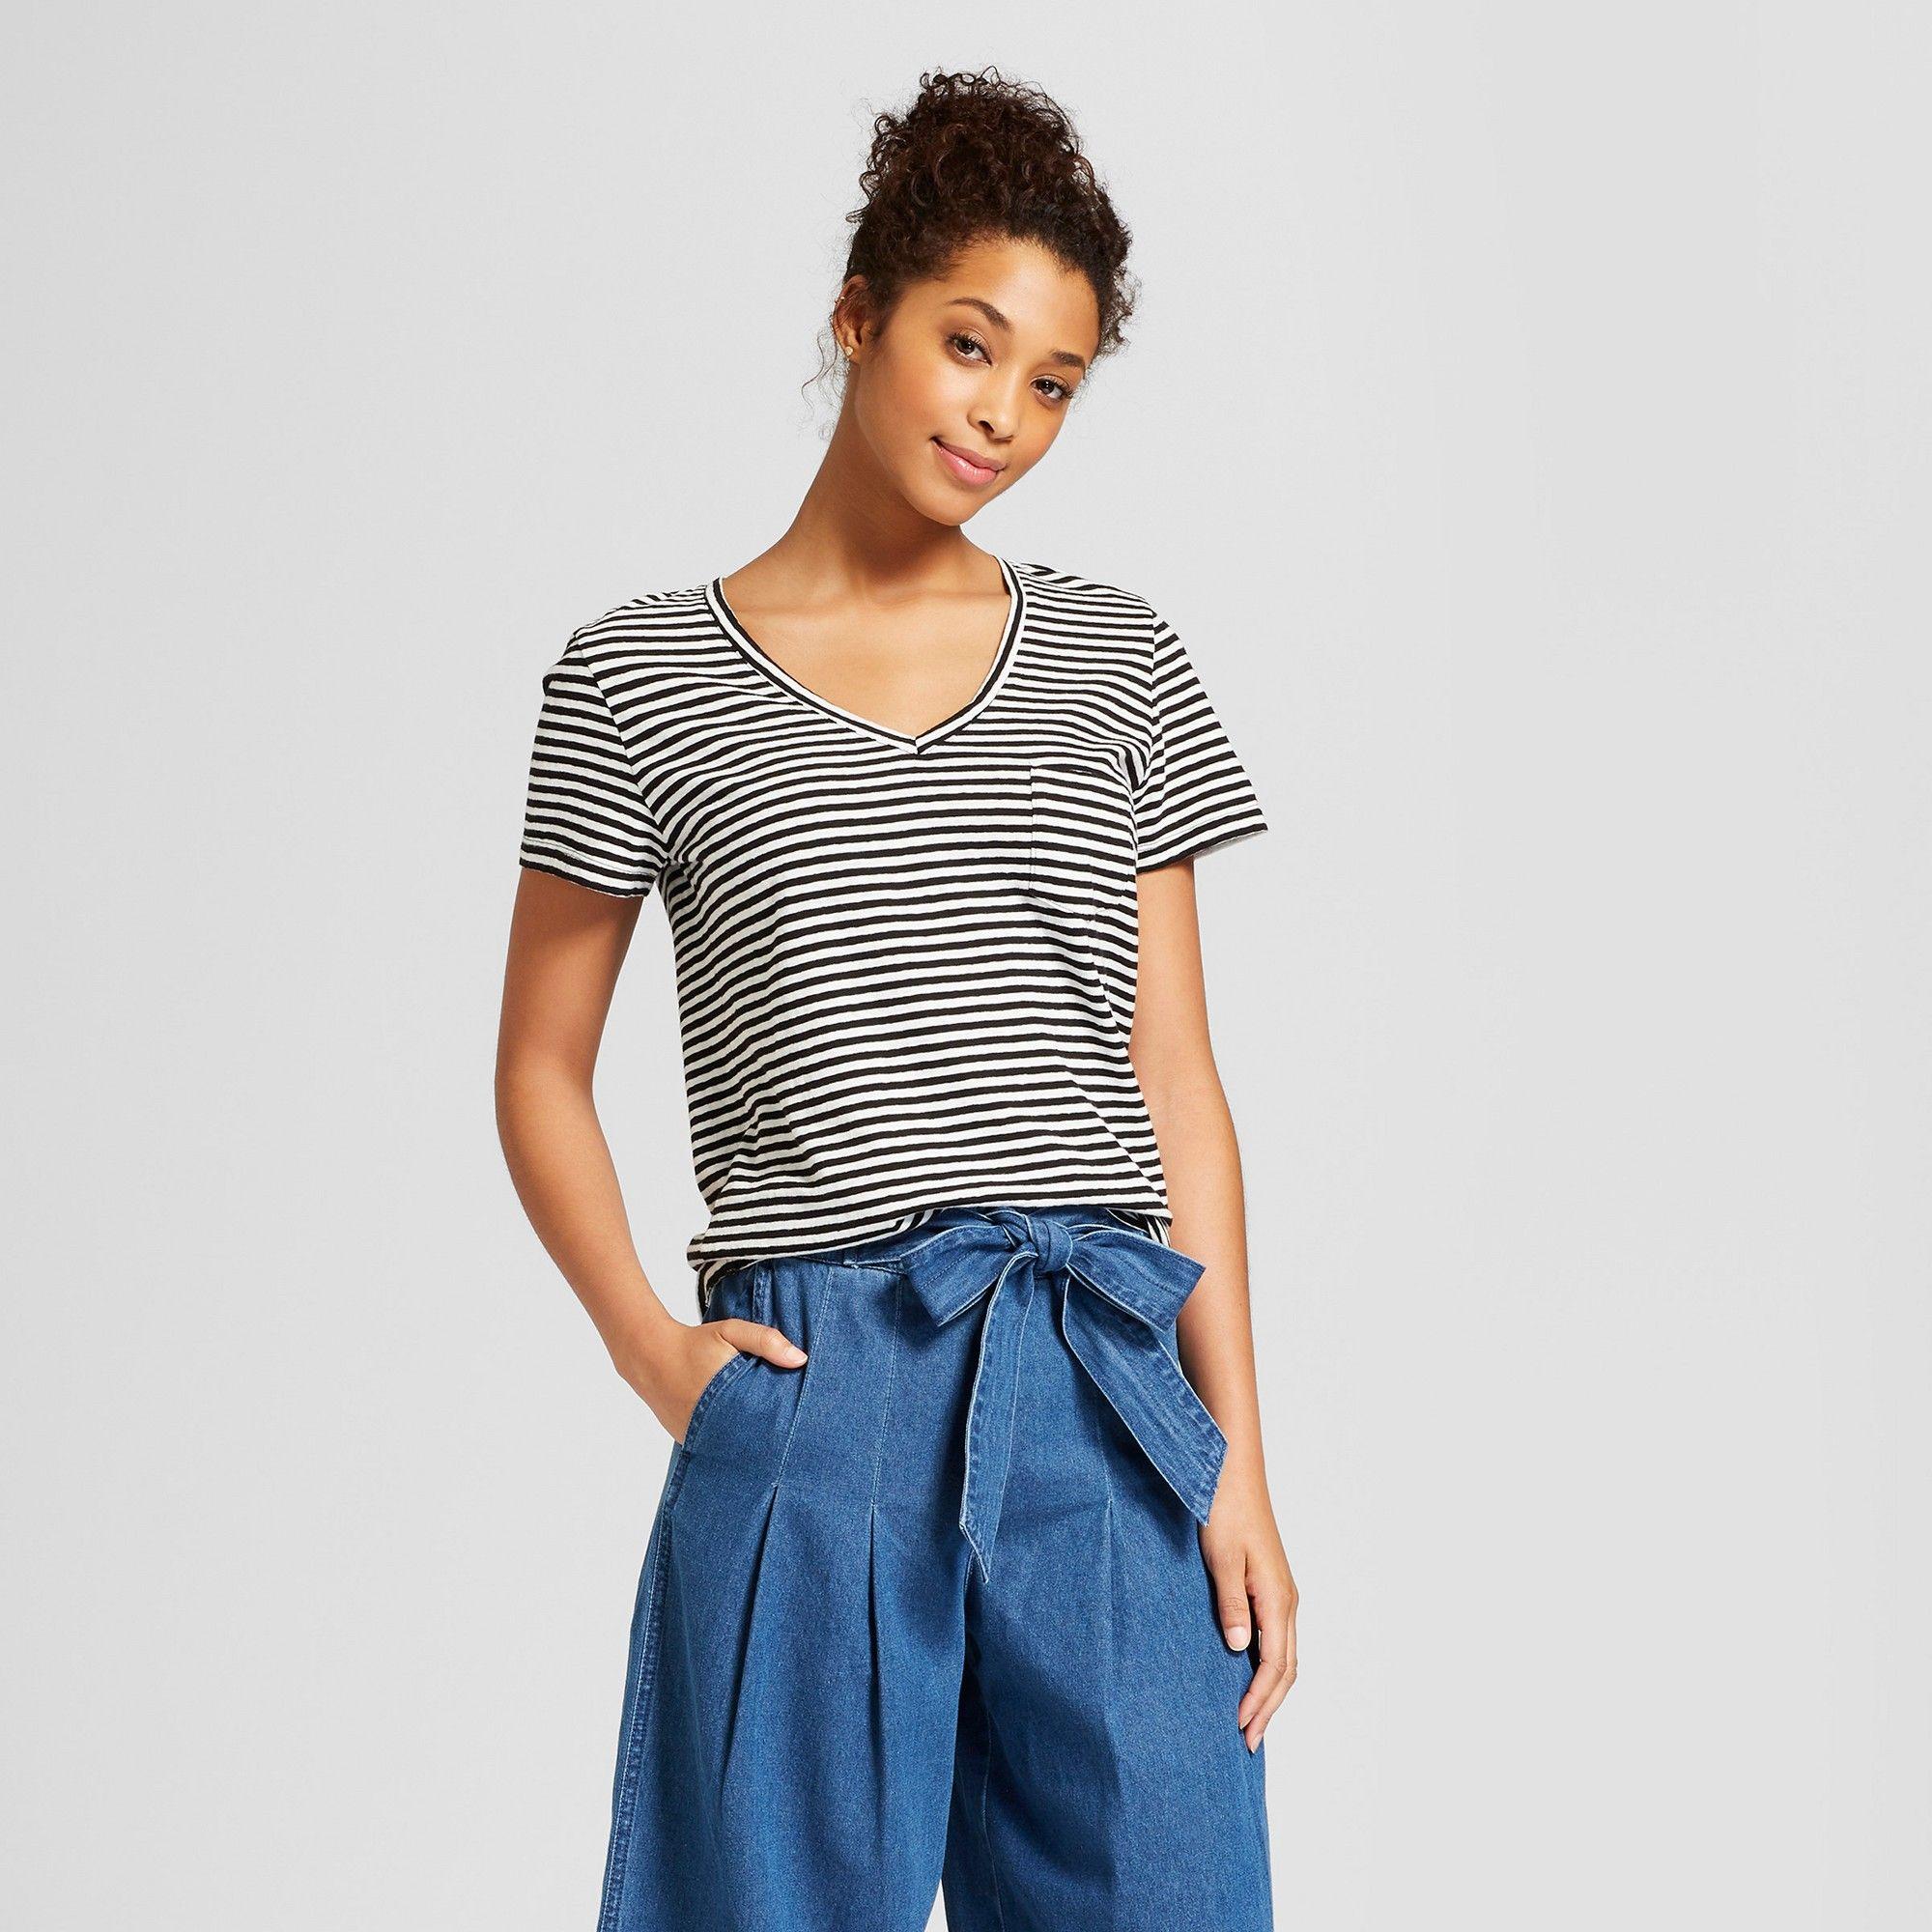 a56b1cf978 Women's Monterey Pocket V-Neck Stripe T-Shirt - Universal Thread ...